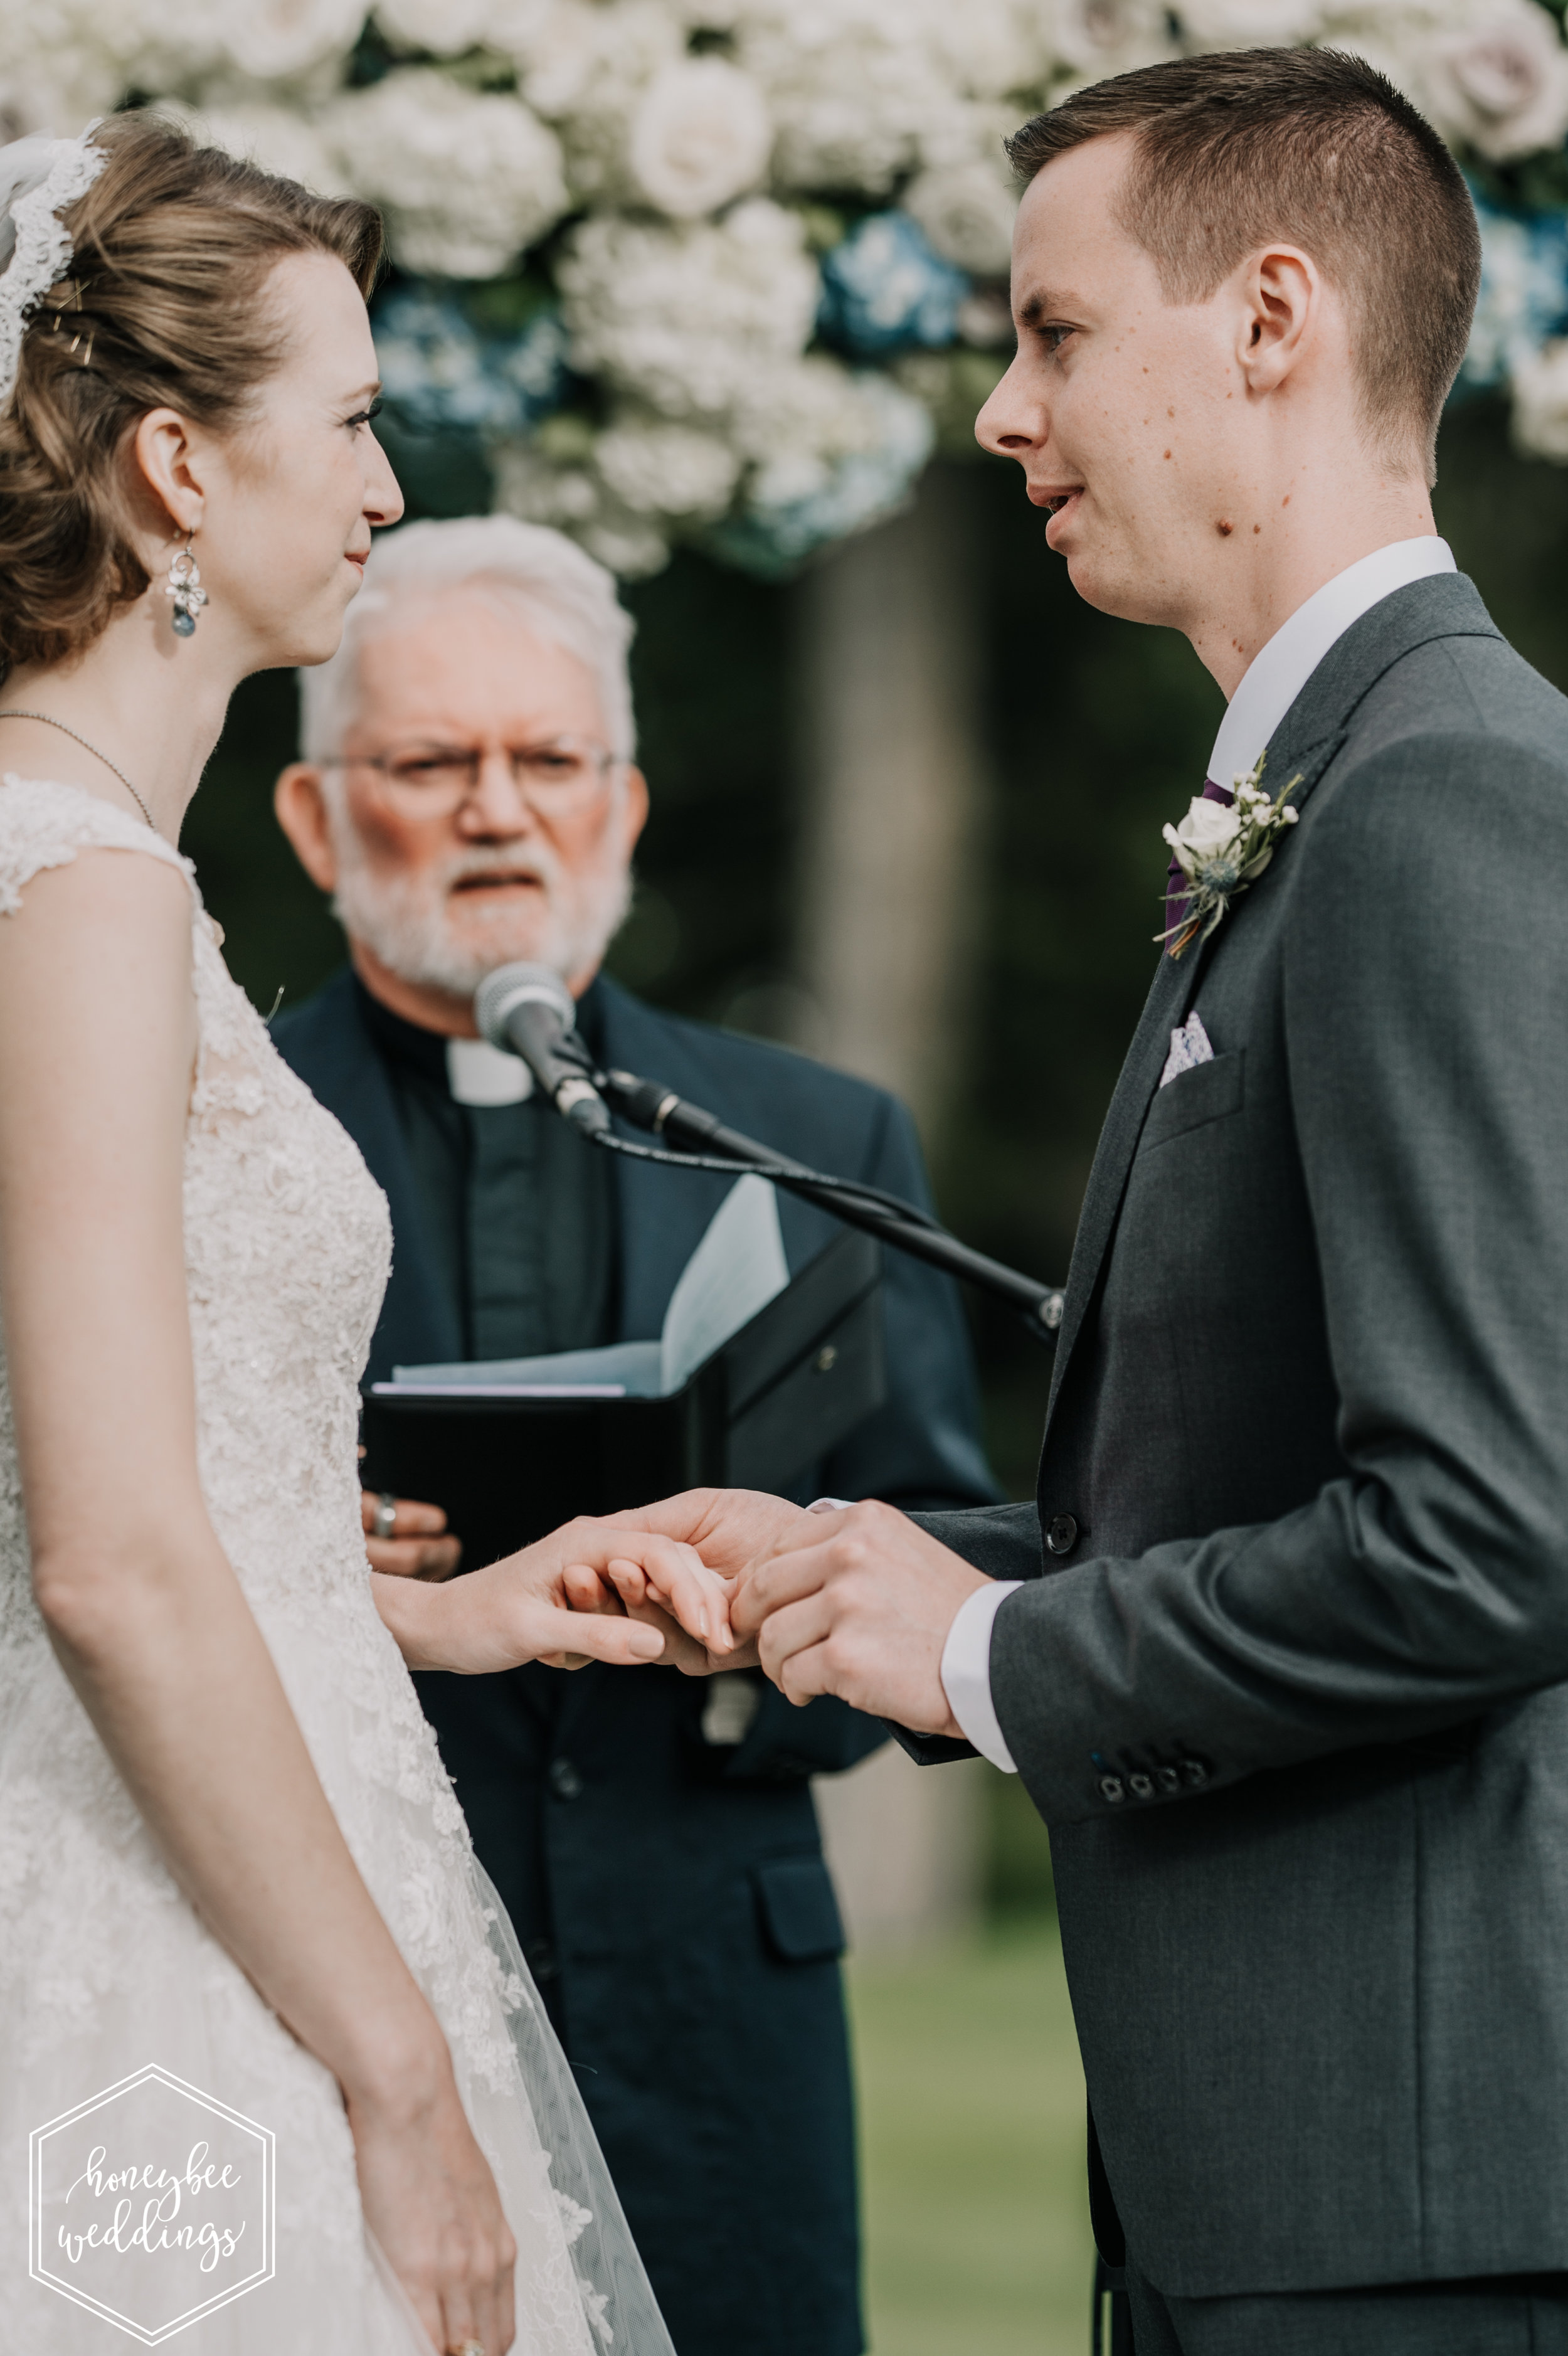 561 Riverside Country Club Wedding_Montana Wedding Photographer_Lauren Jackson + Evan Ivaldi 2018-6686.jpg